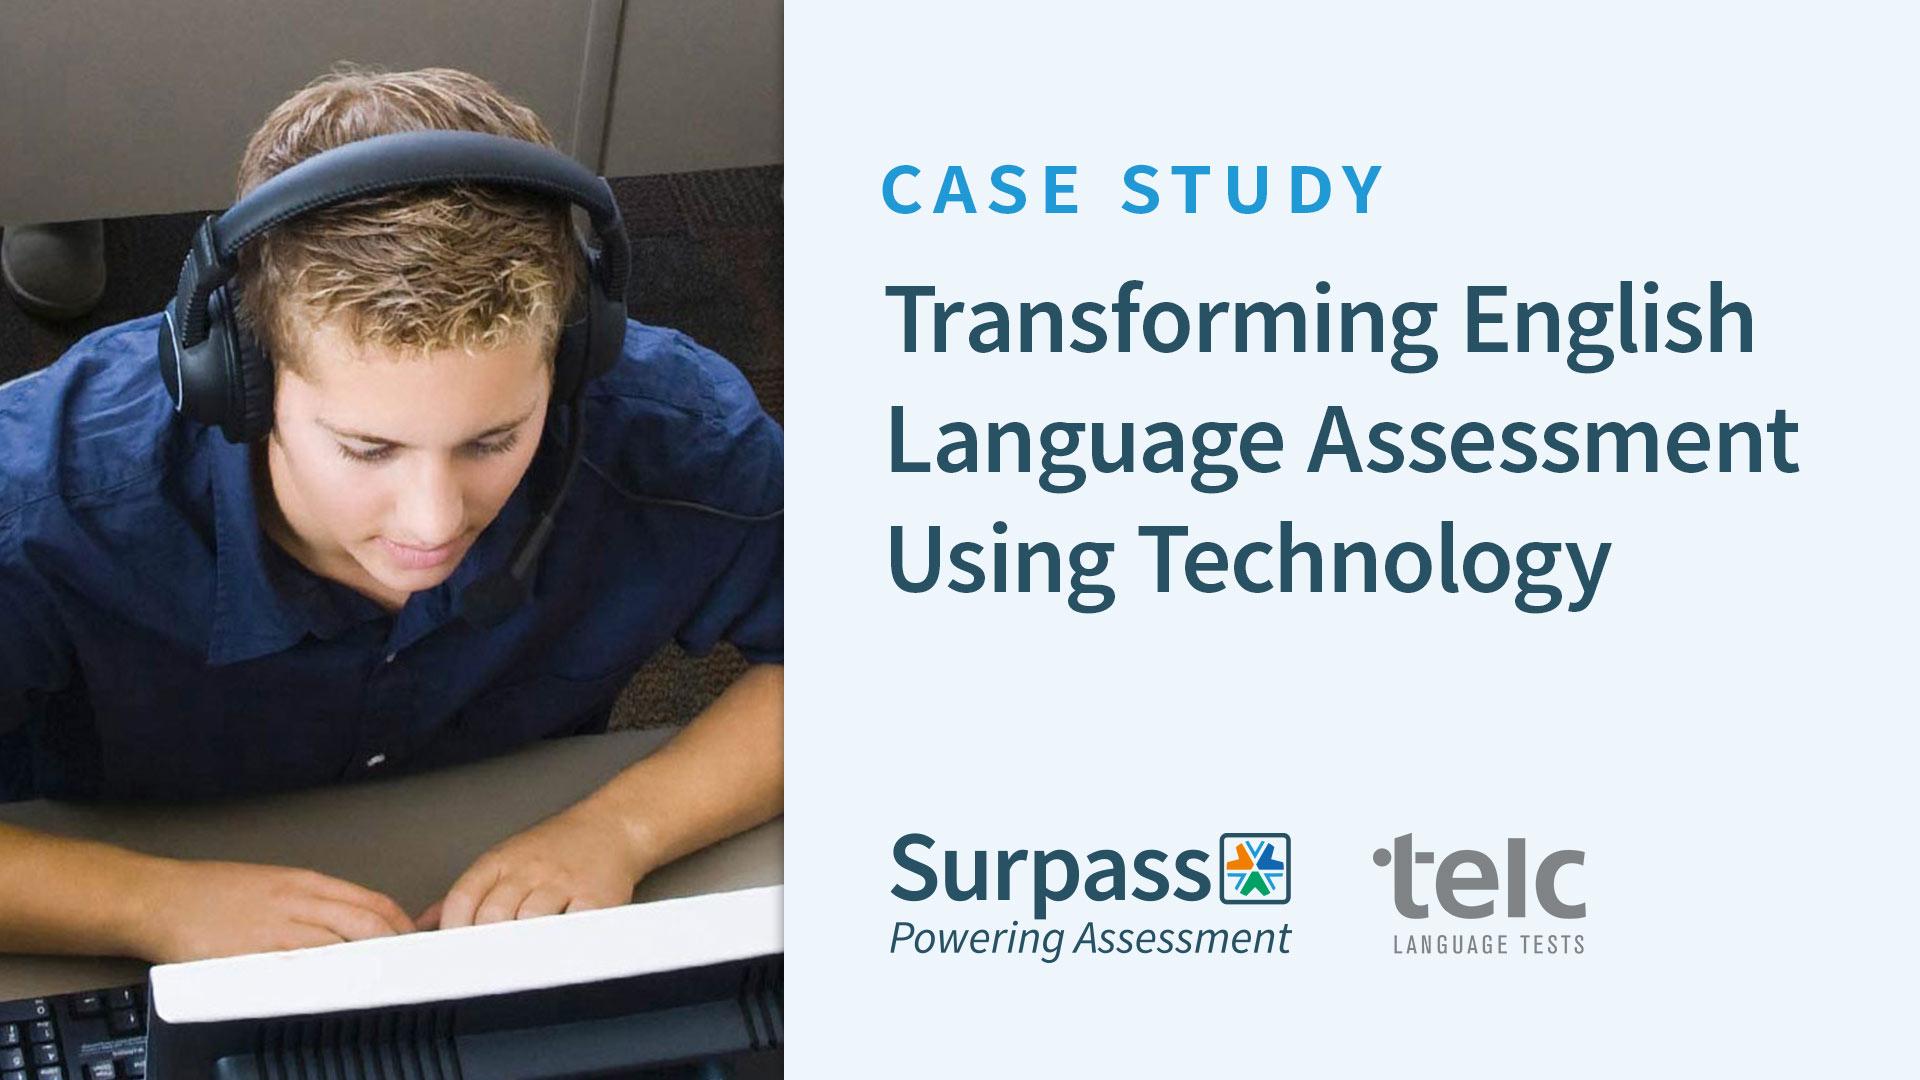 Case Study – Transforming English Language Assessment Using Technology